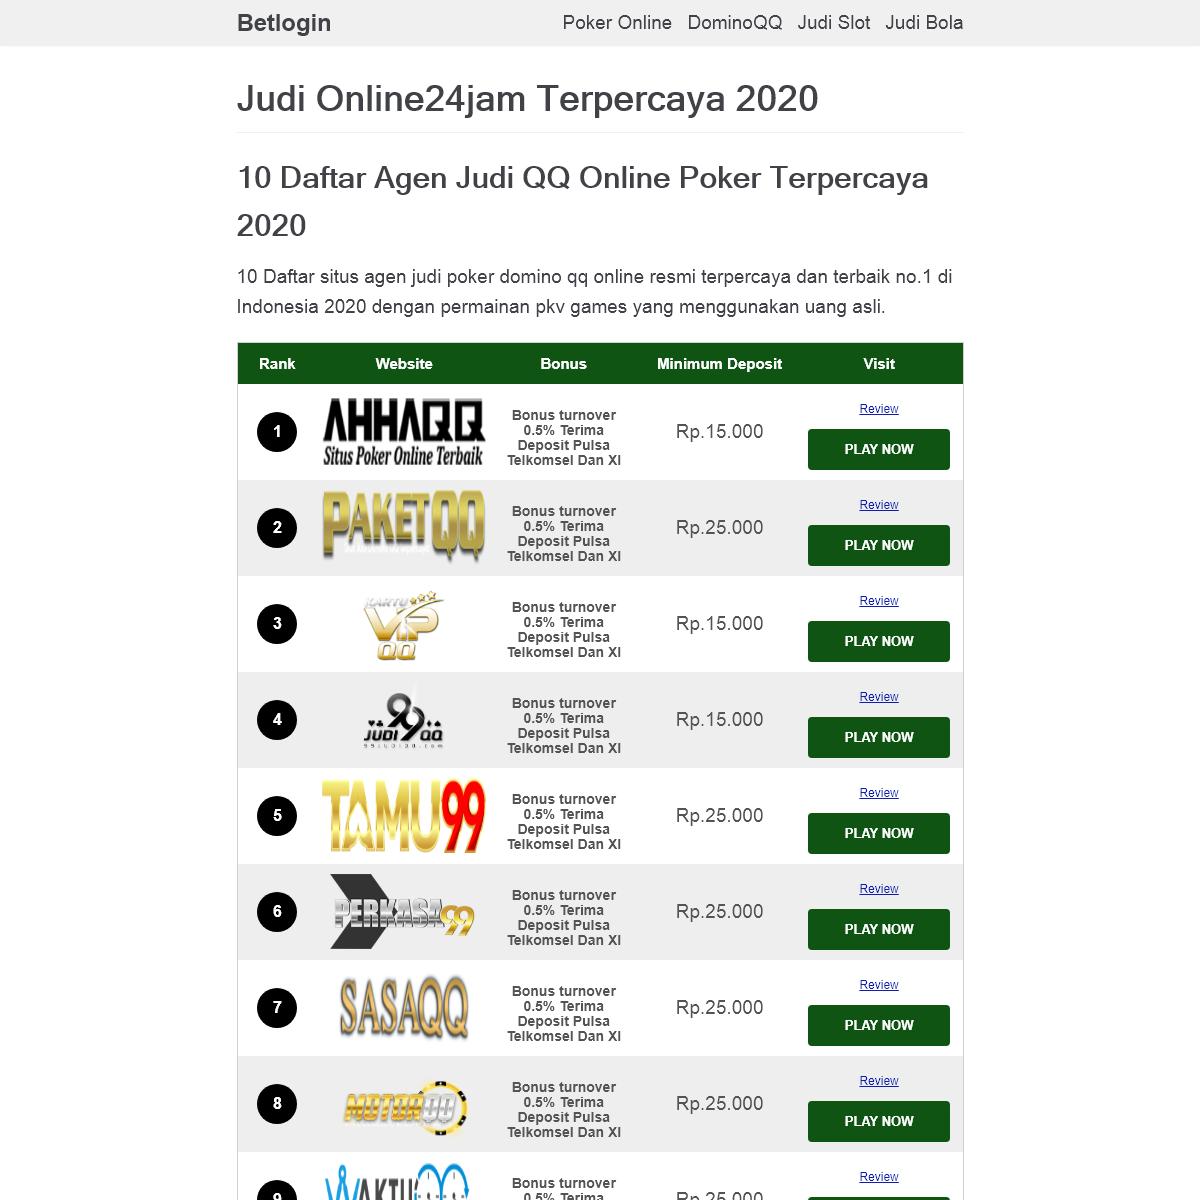 Judi Online24jam Terpercaya 2020 - Betlogin